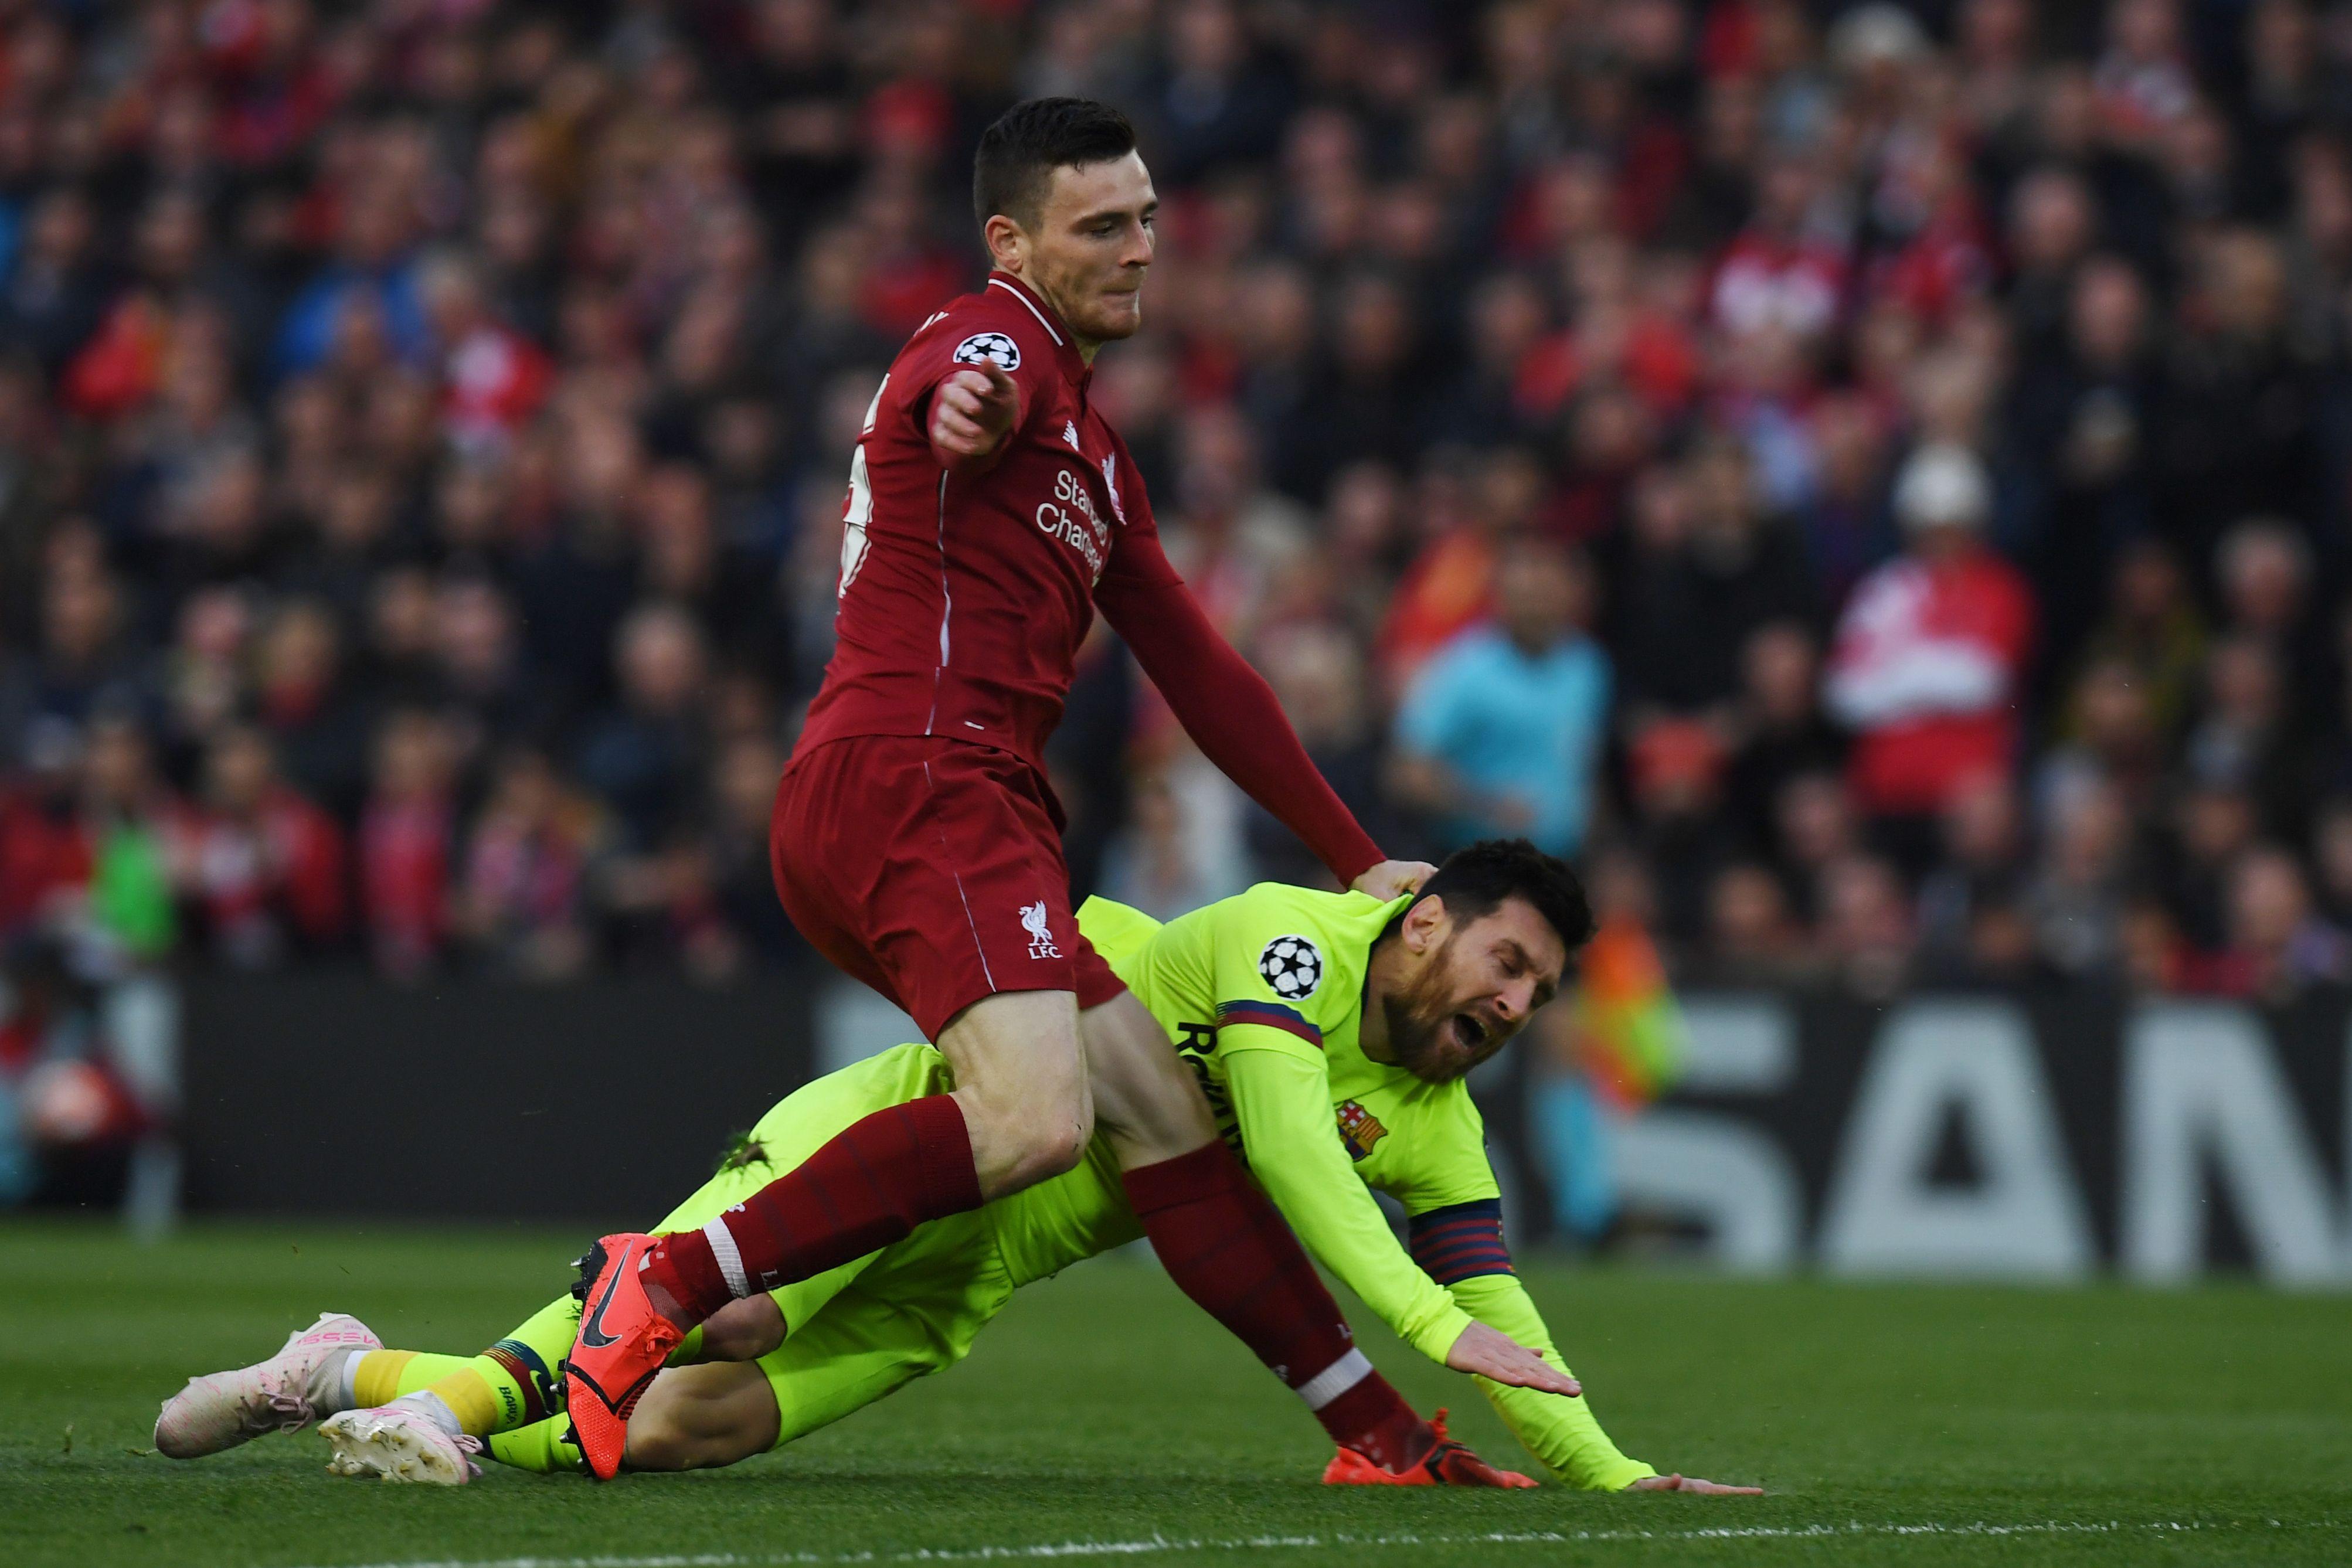 Giliran Robertson Menepi, Badai Cedera Belum Reda di Liverpool